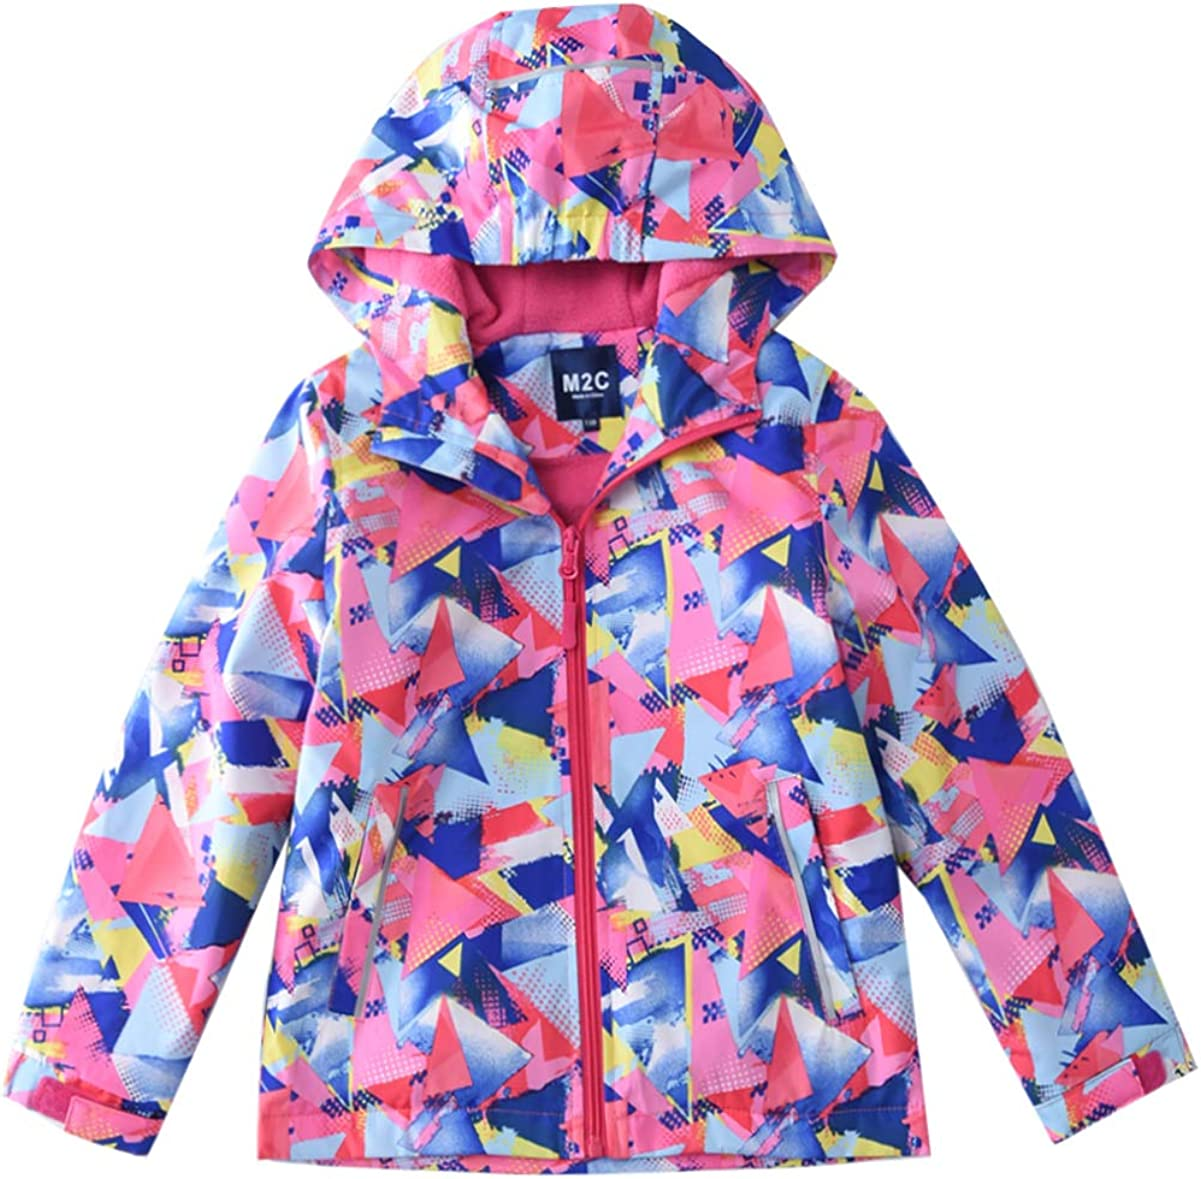 M2C Girls Hooded Fleece Limited time trial price Lined 1 year warranty Waterproof Jacket